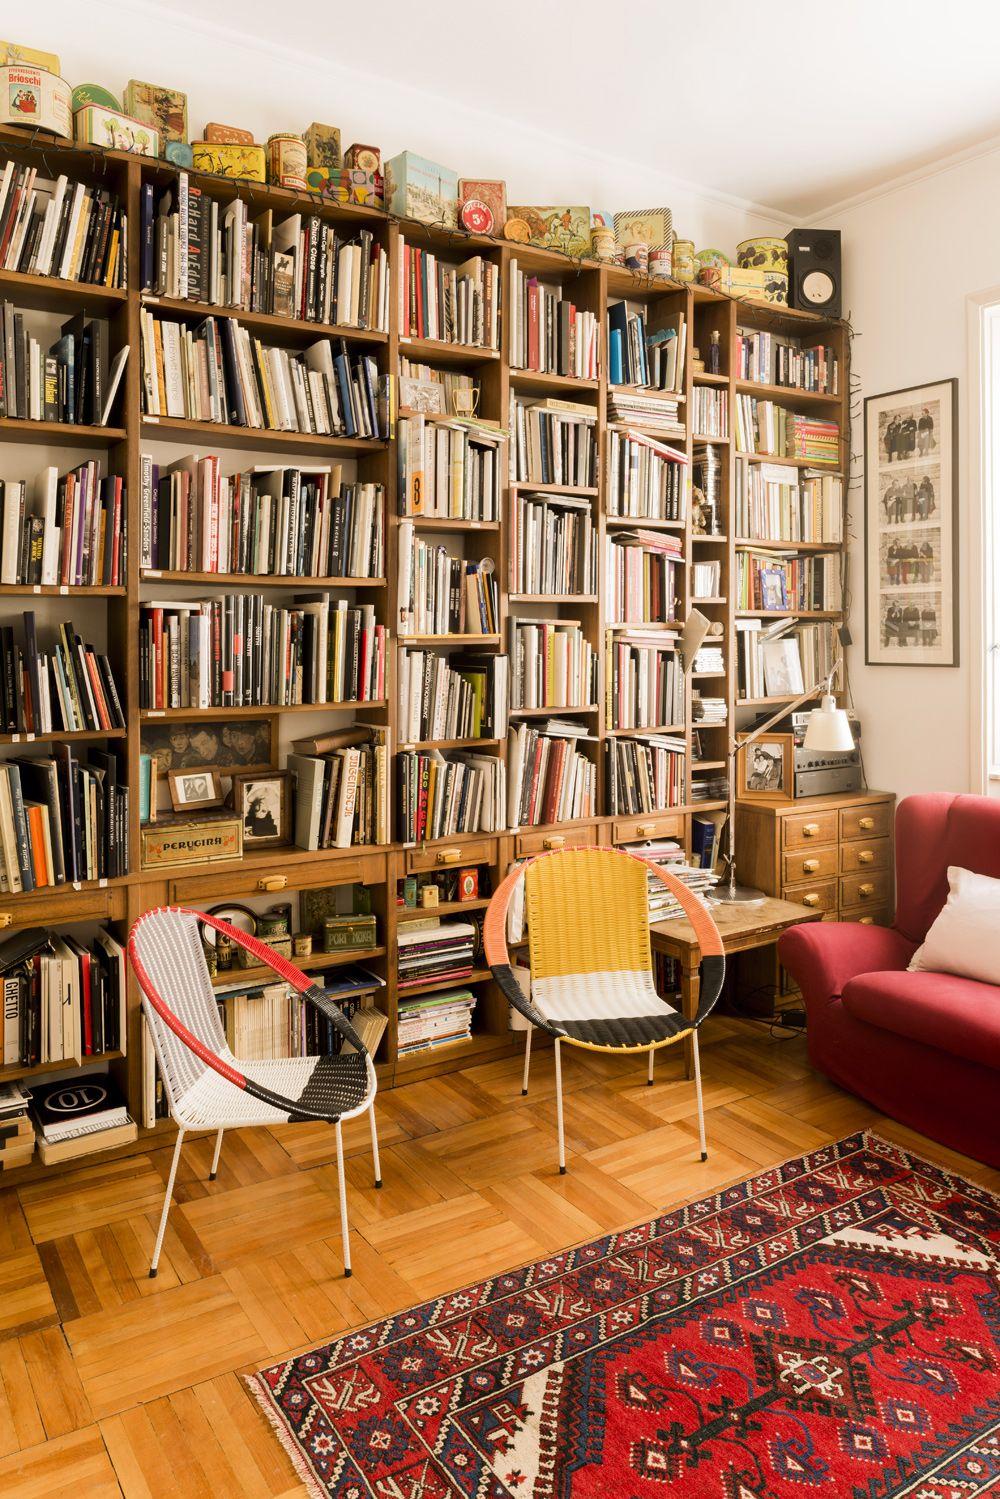 marni s anti camera issue 4 cucumber b cher bibliothek und regal. Black Bedroom Furniture Sets. Home Design Ideas